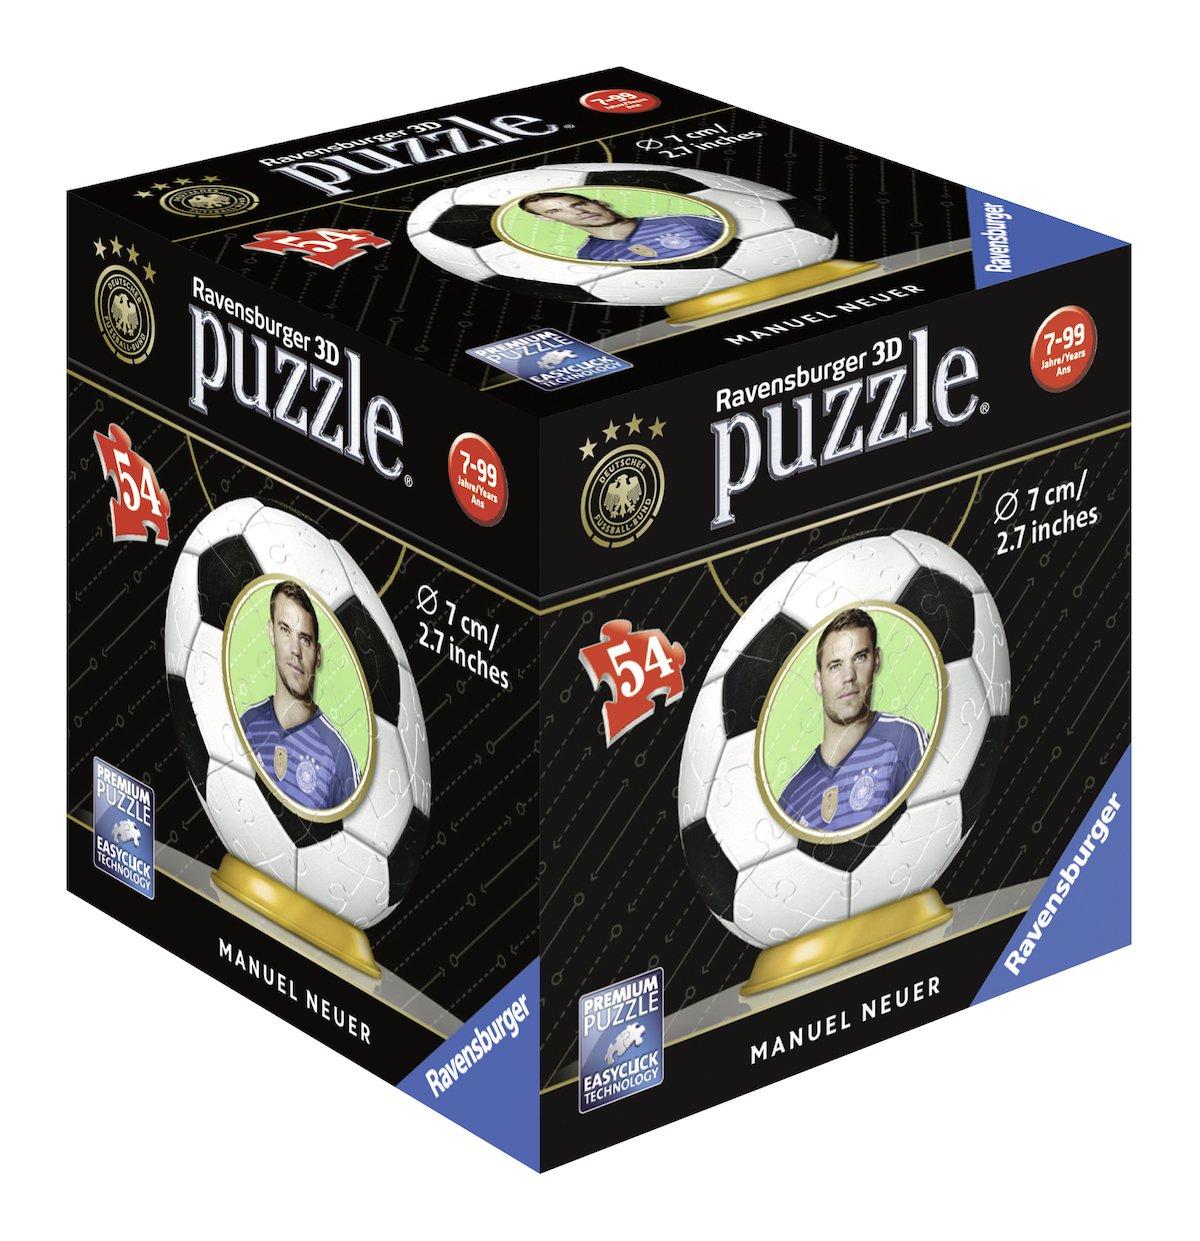 Ravensburger Erwachsenenpuzzle 11926 Manuel DFB Spieler 3D-Puzzle Ravensburger Spielverlag